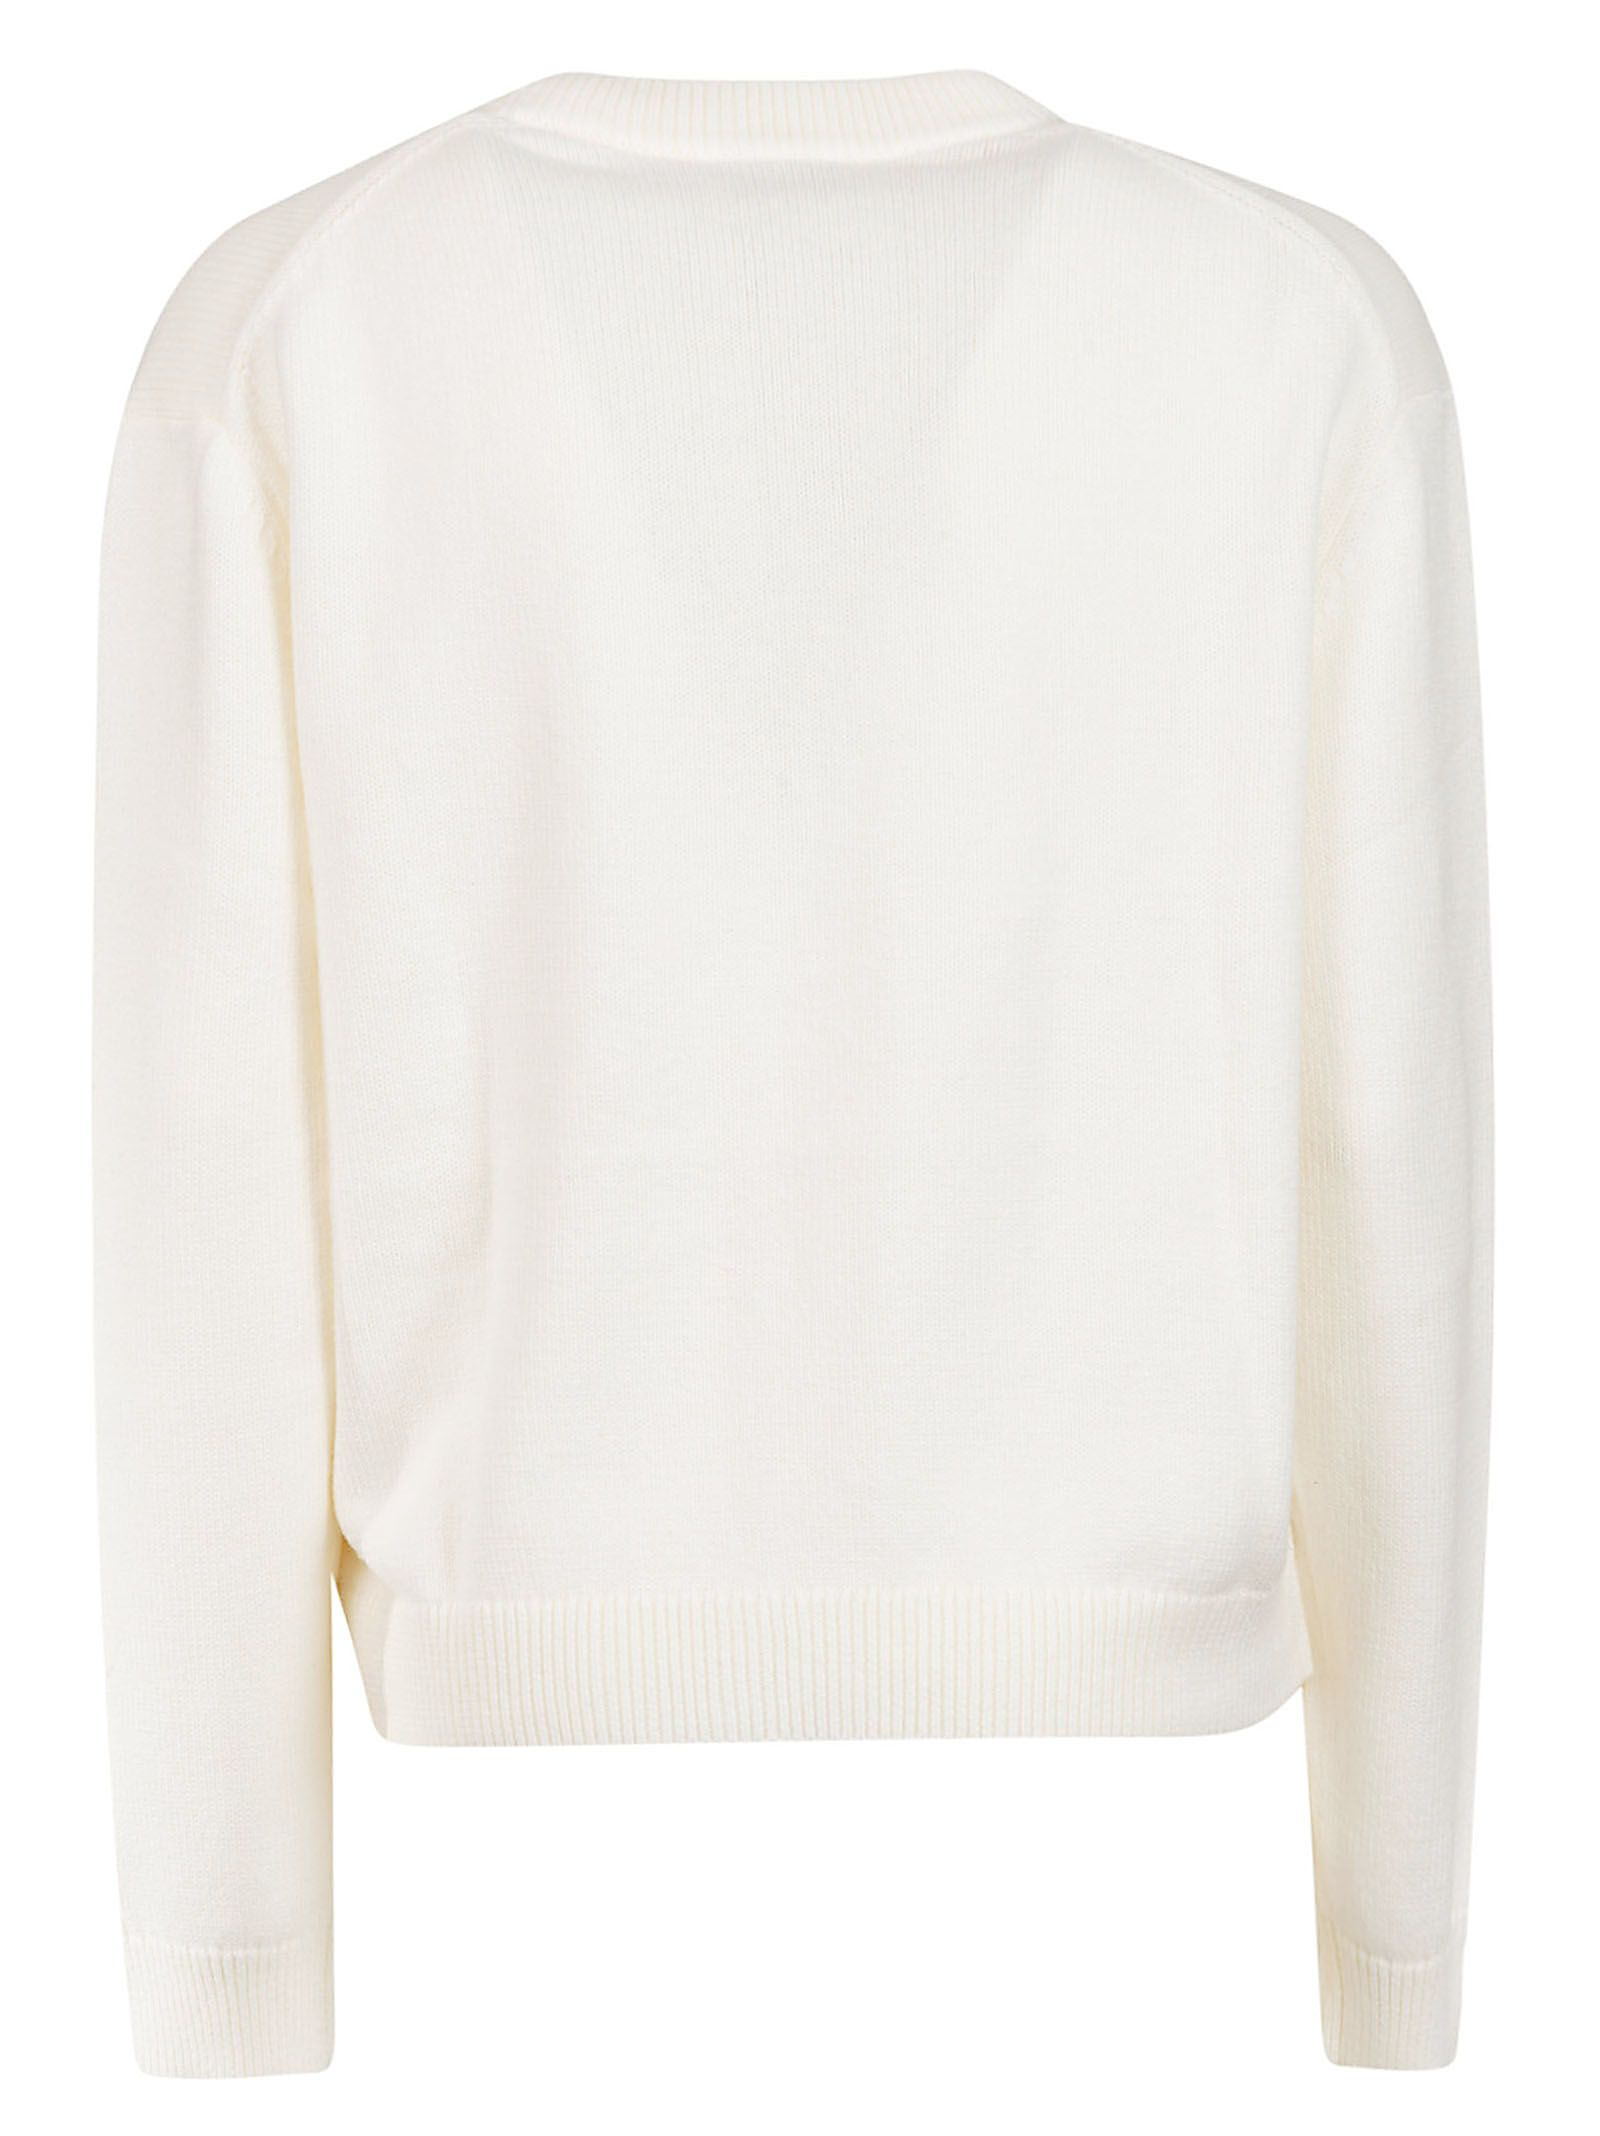 f94d38f6 Kenzo Embroidered Tiger Sweatshirt - Blanc Kenzo Embroidered Tiger  Sweatshirt - Blanc